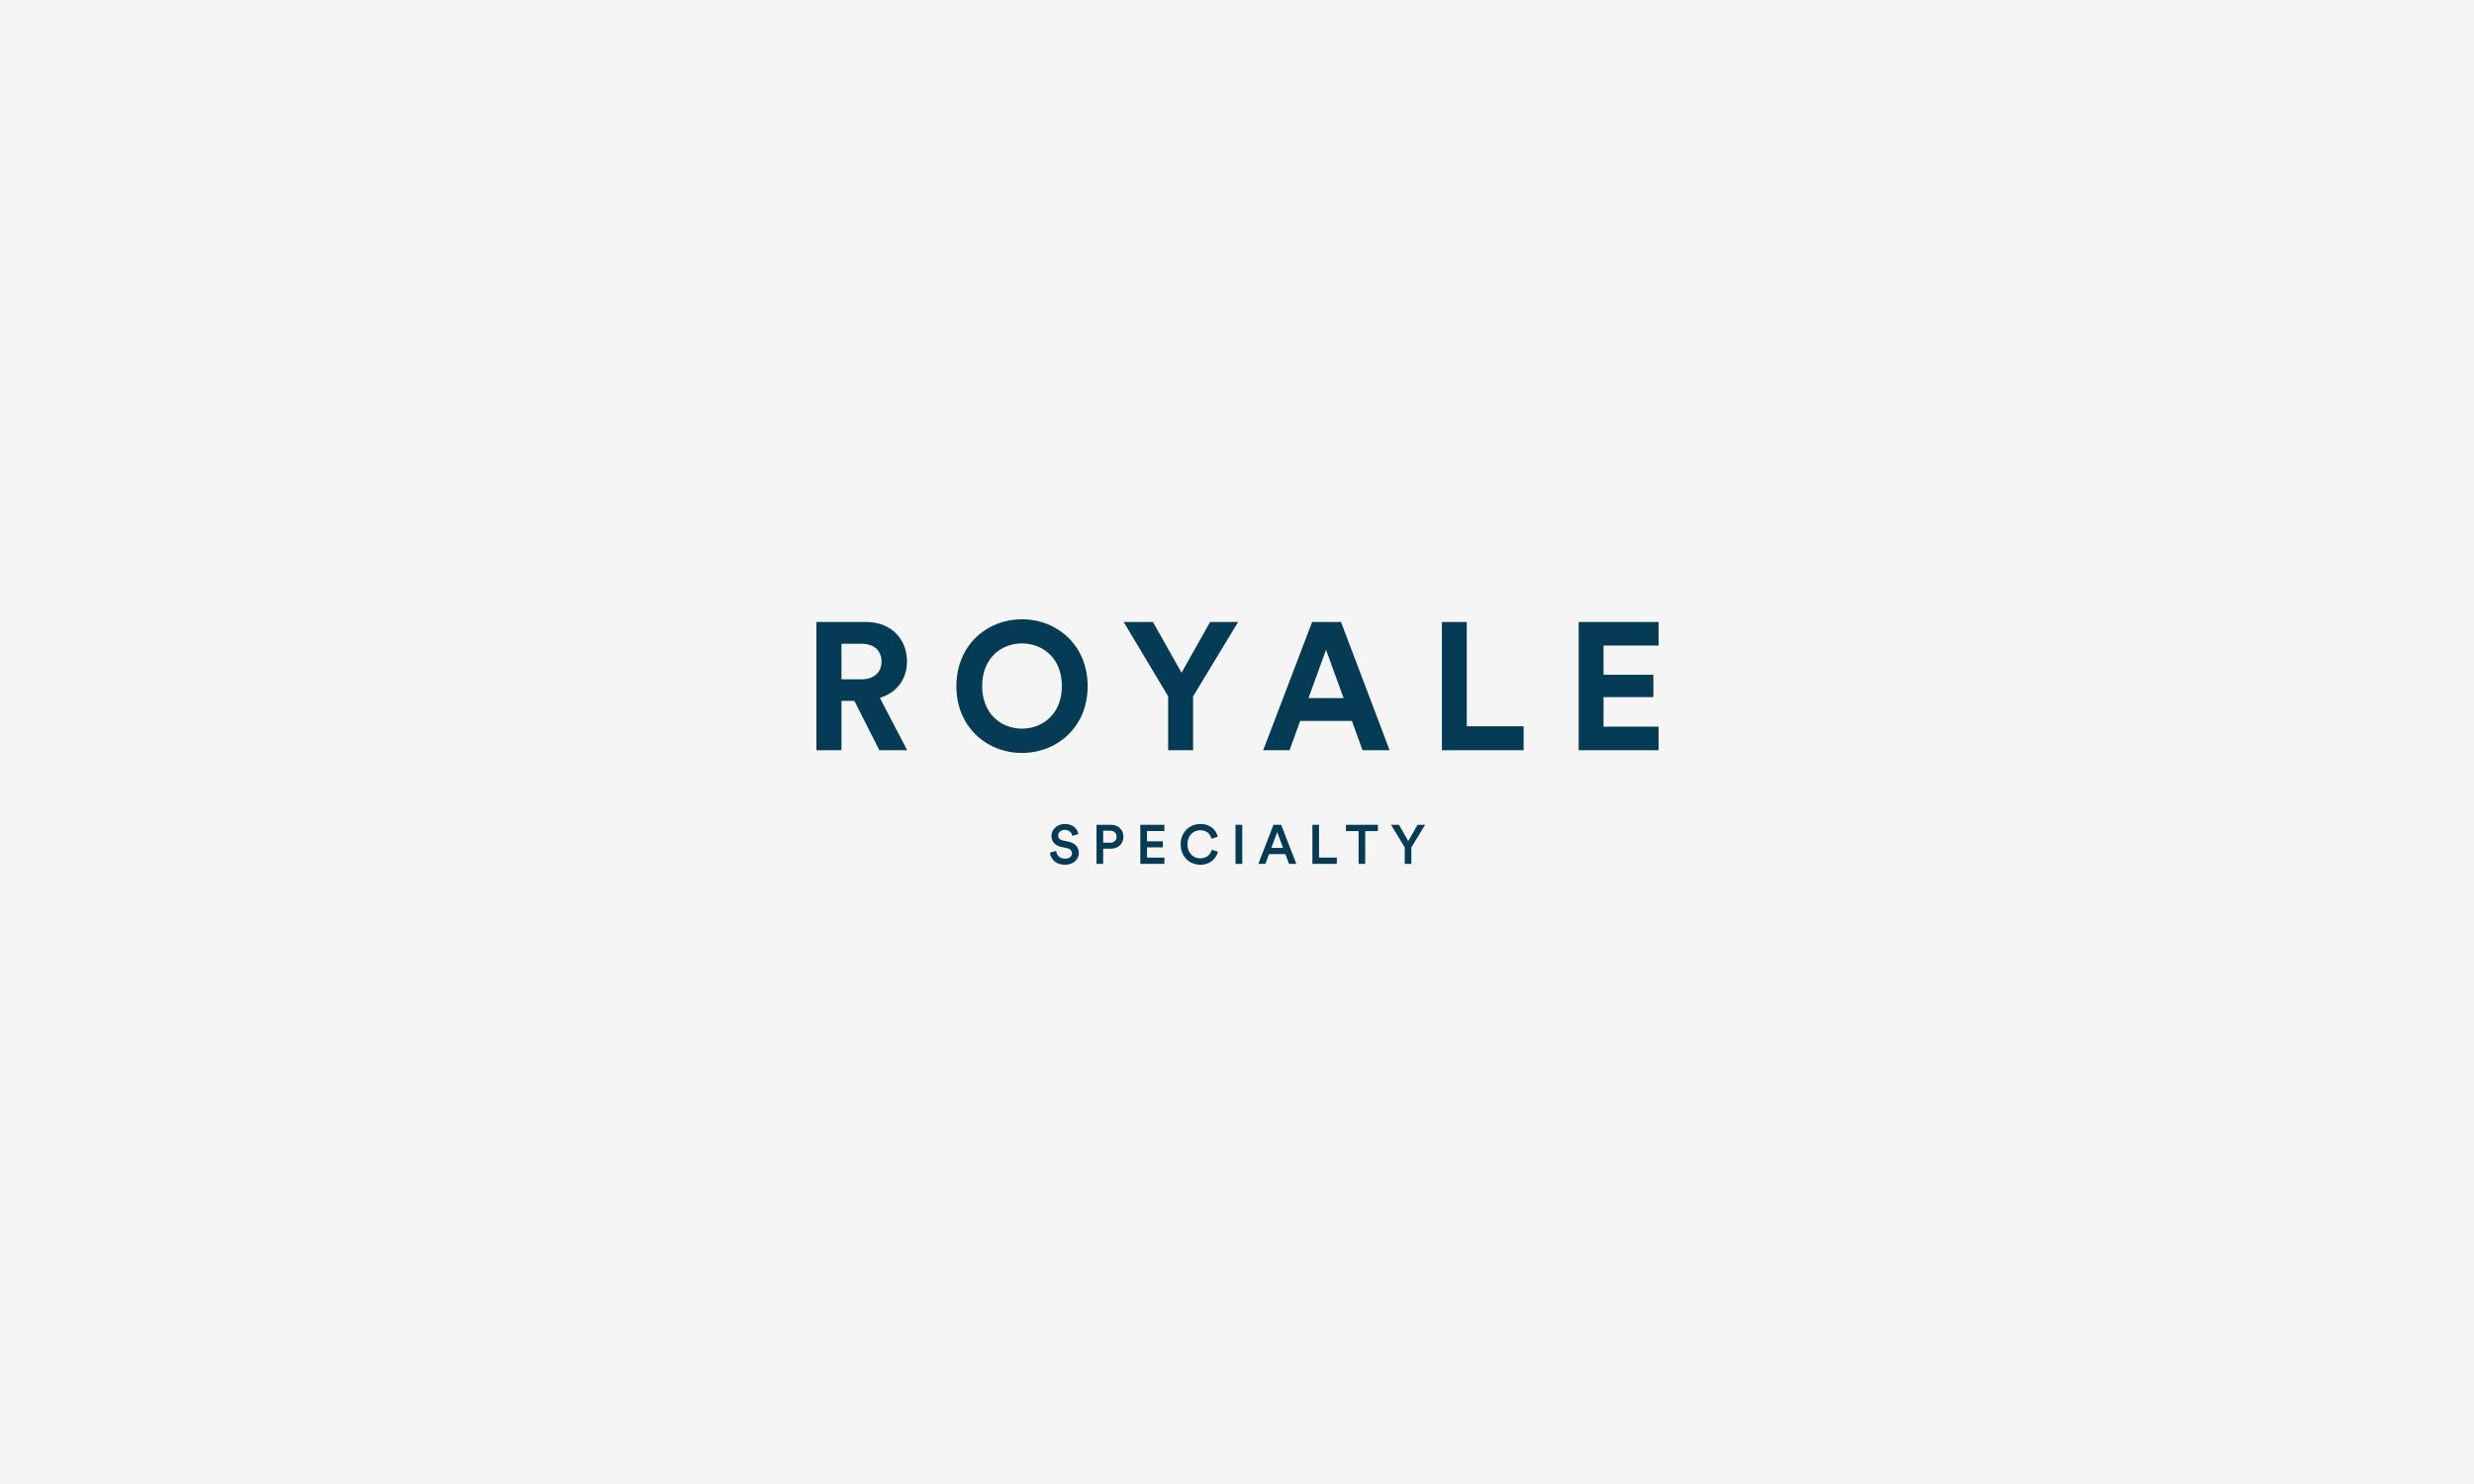 Nectar-&-Co-Royale-Specialty-Primary-Logo.jpg